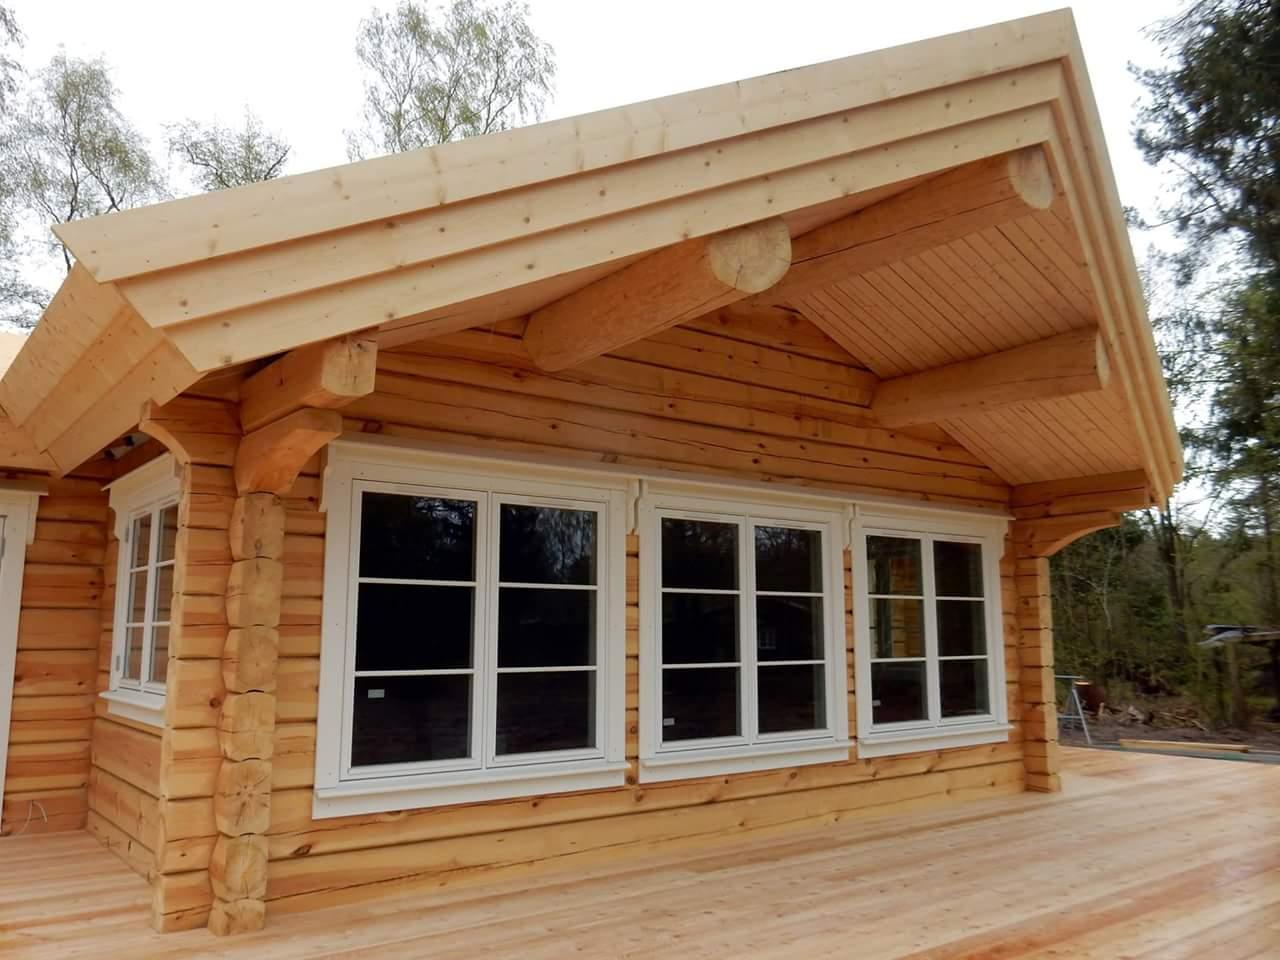 Casas de madera natural dise os arquitect nicos - Casas de madera natural ...